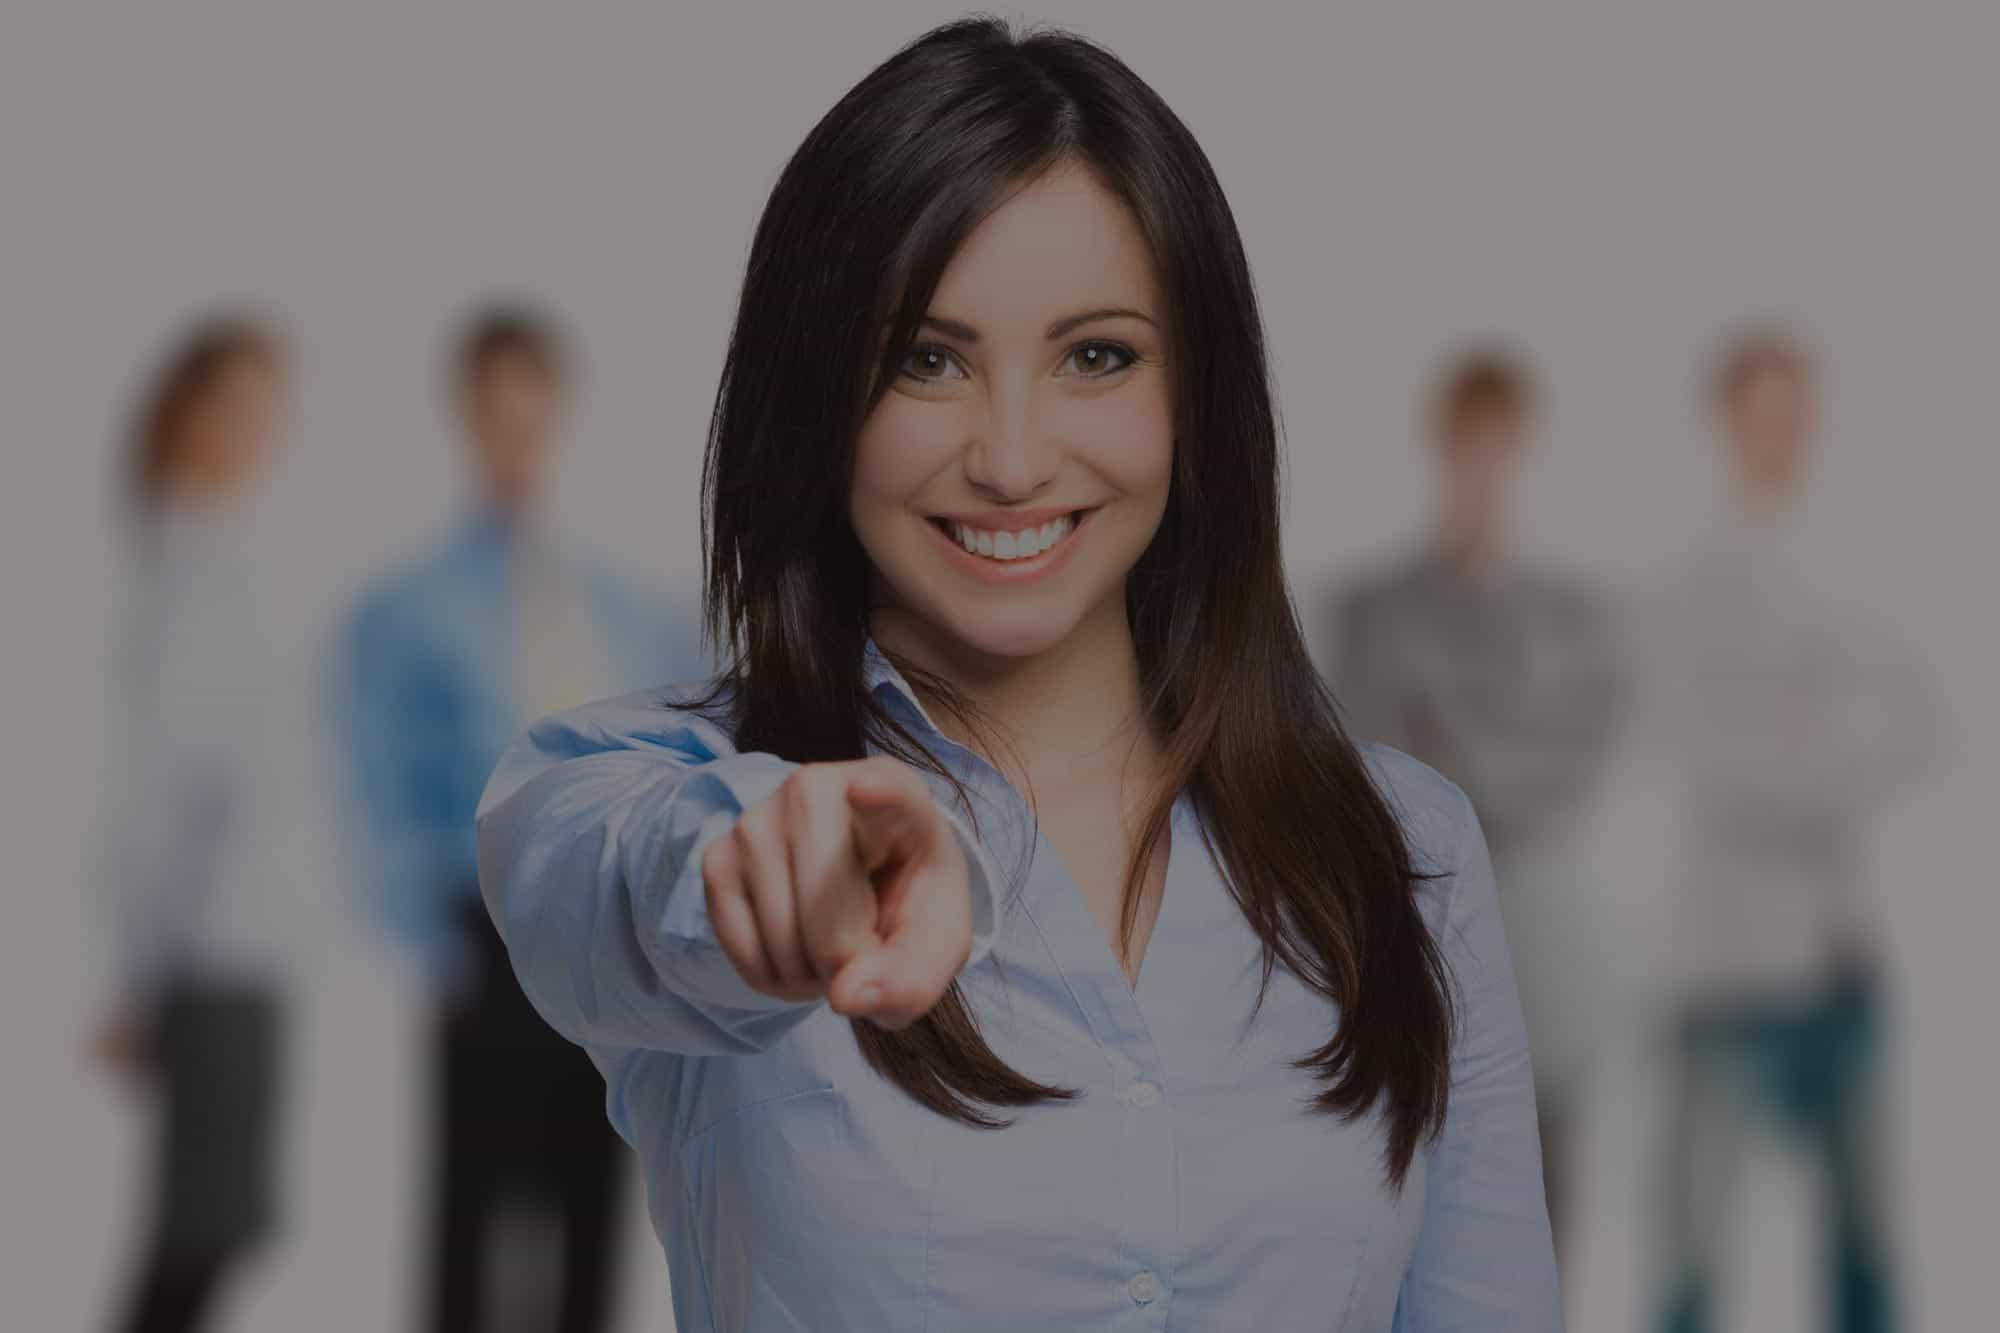 RECRUTEMENT-Emploi-Jobs-Offre-Poste-PFI